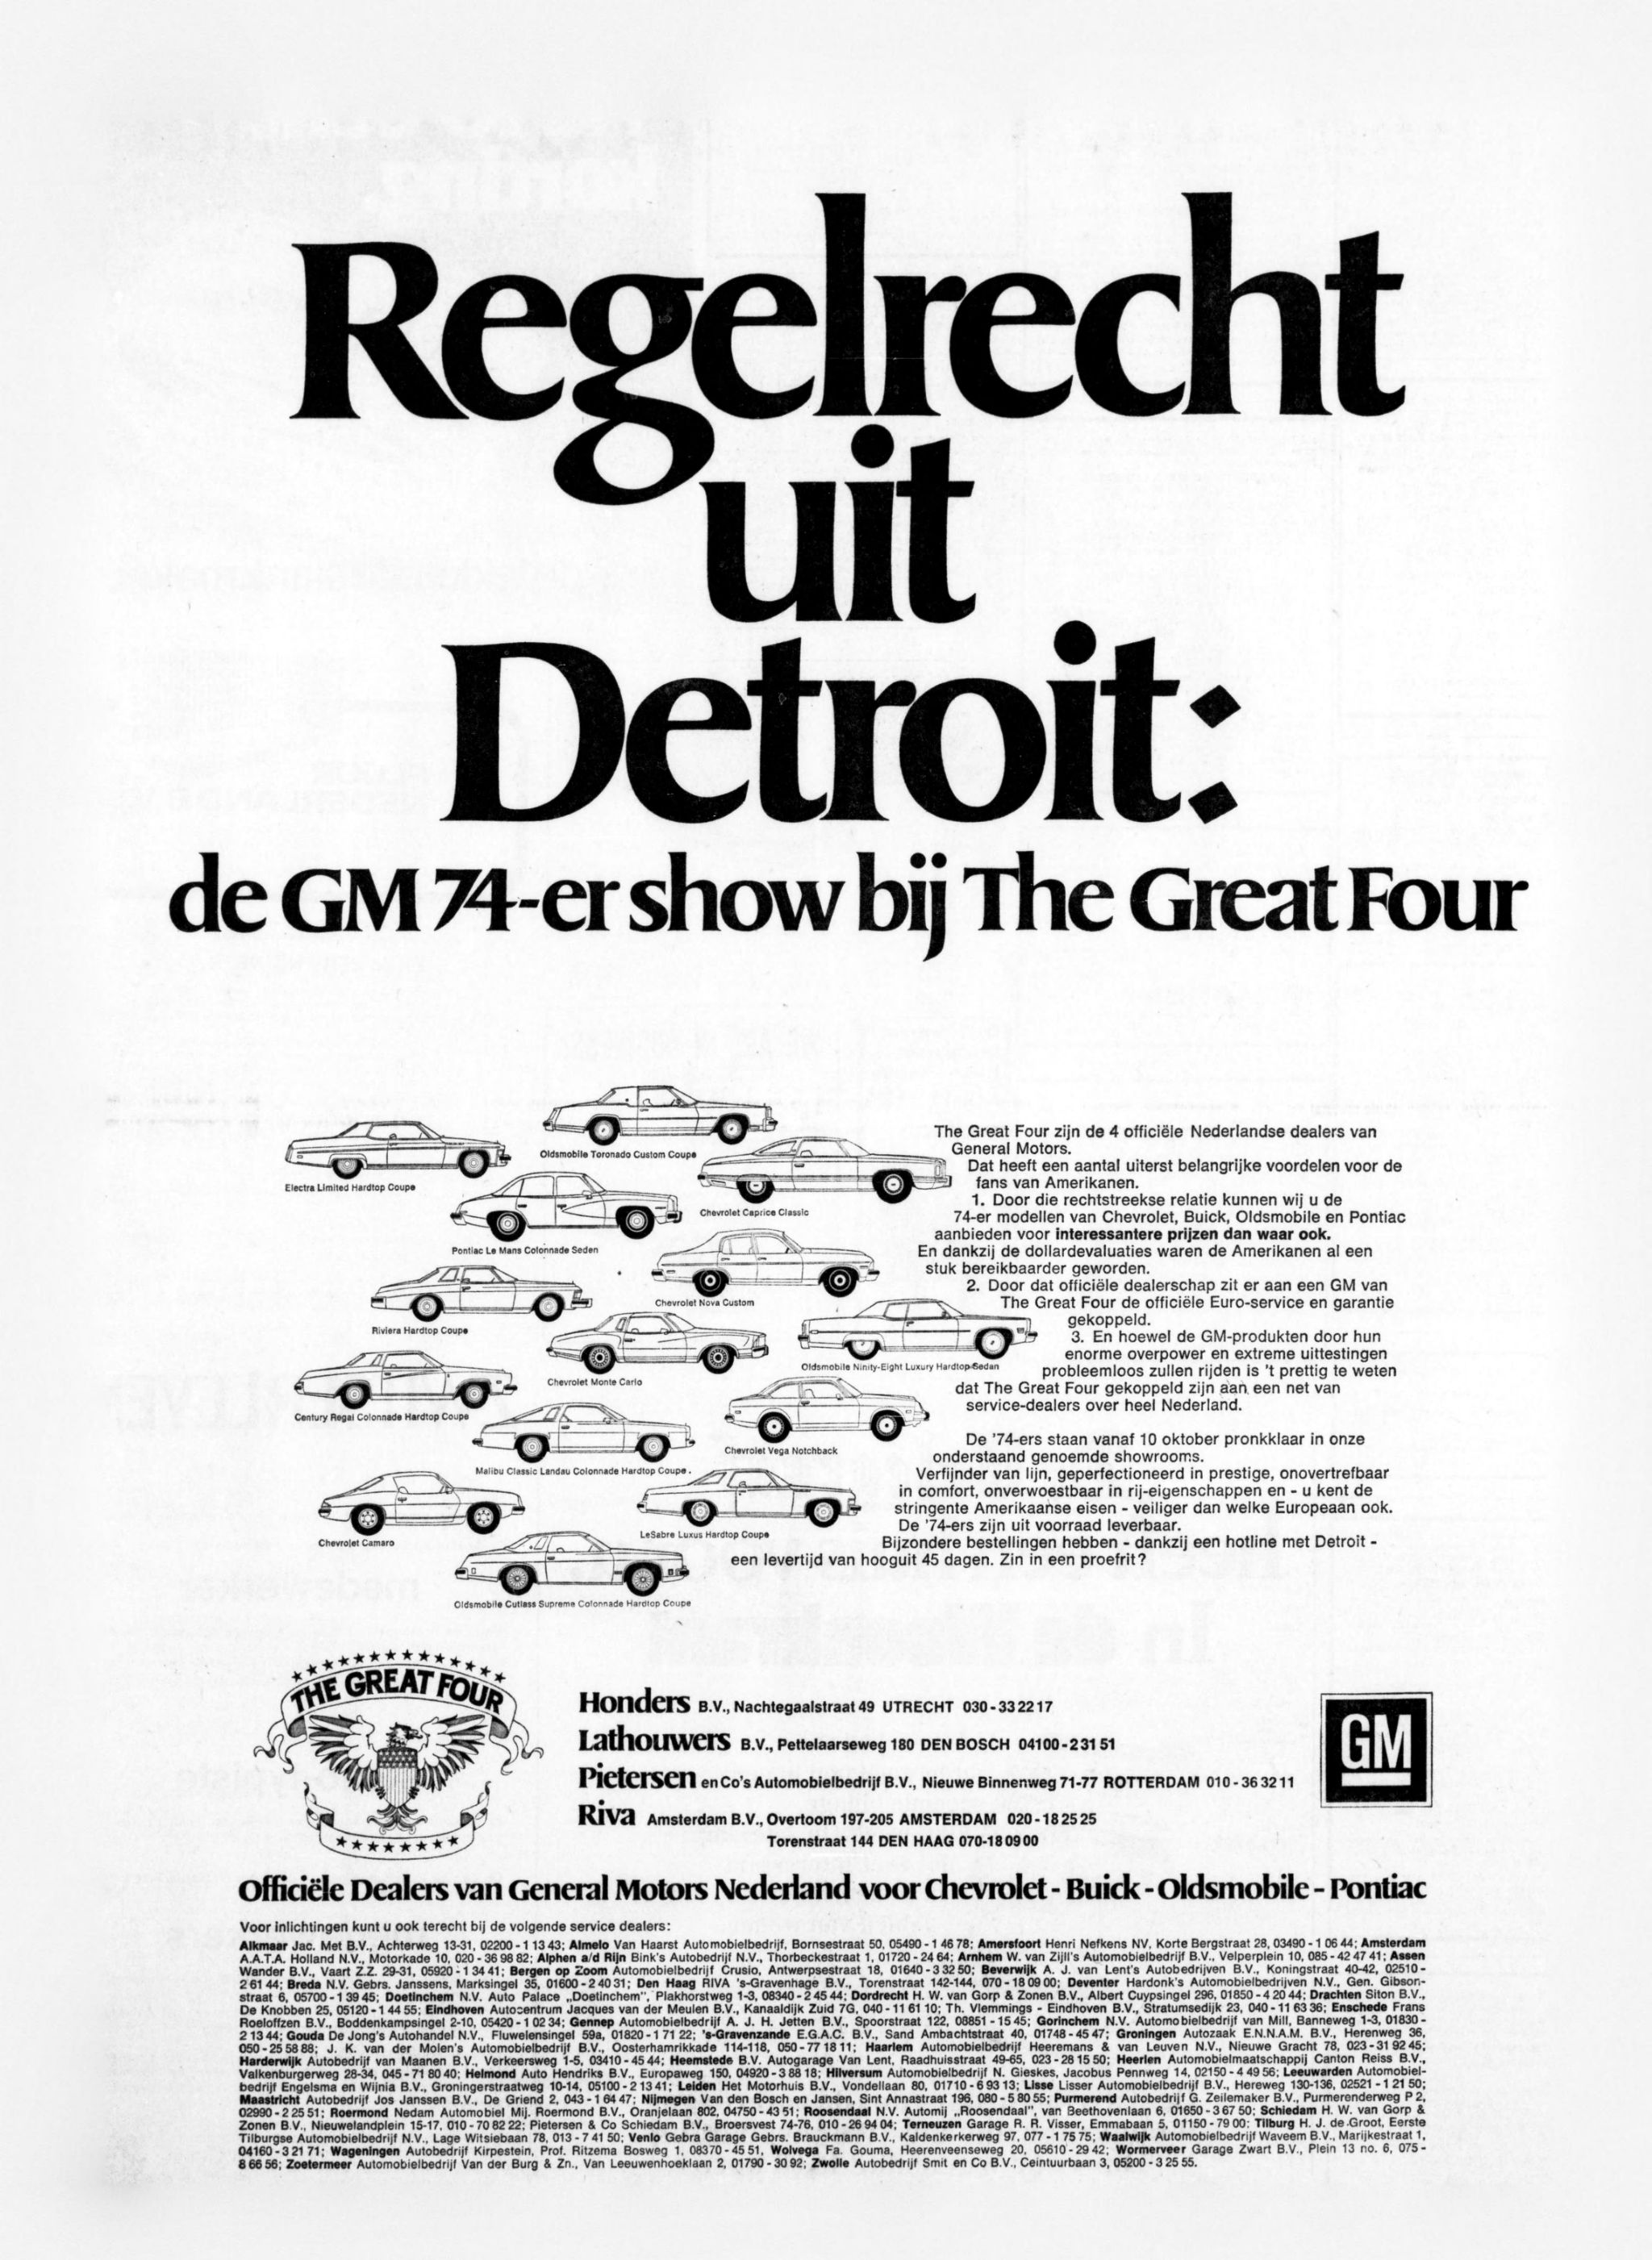 1973 GM